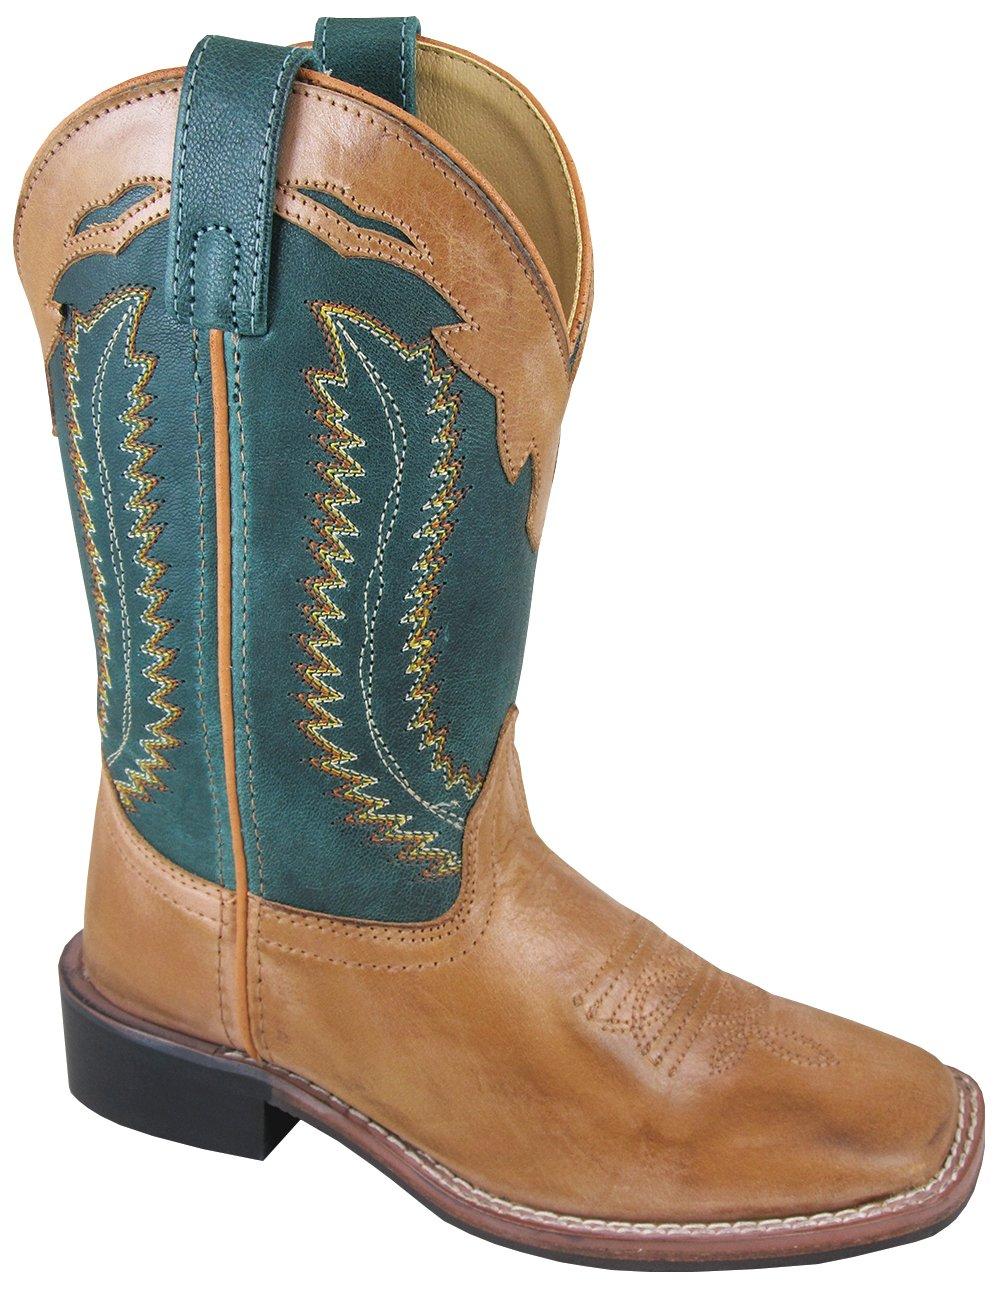 Smoky Frank Children Cowboy Boot, Tan, 13M